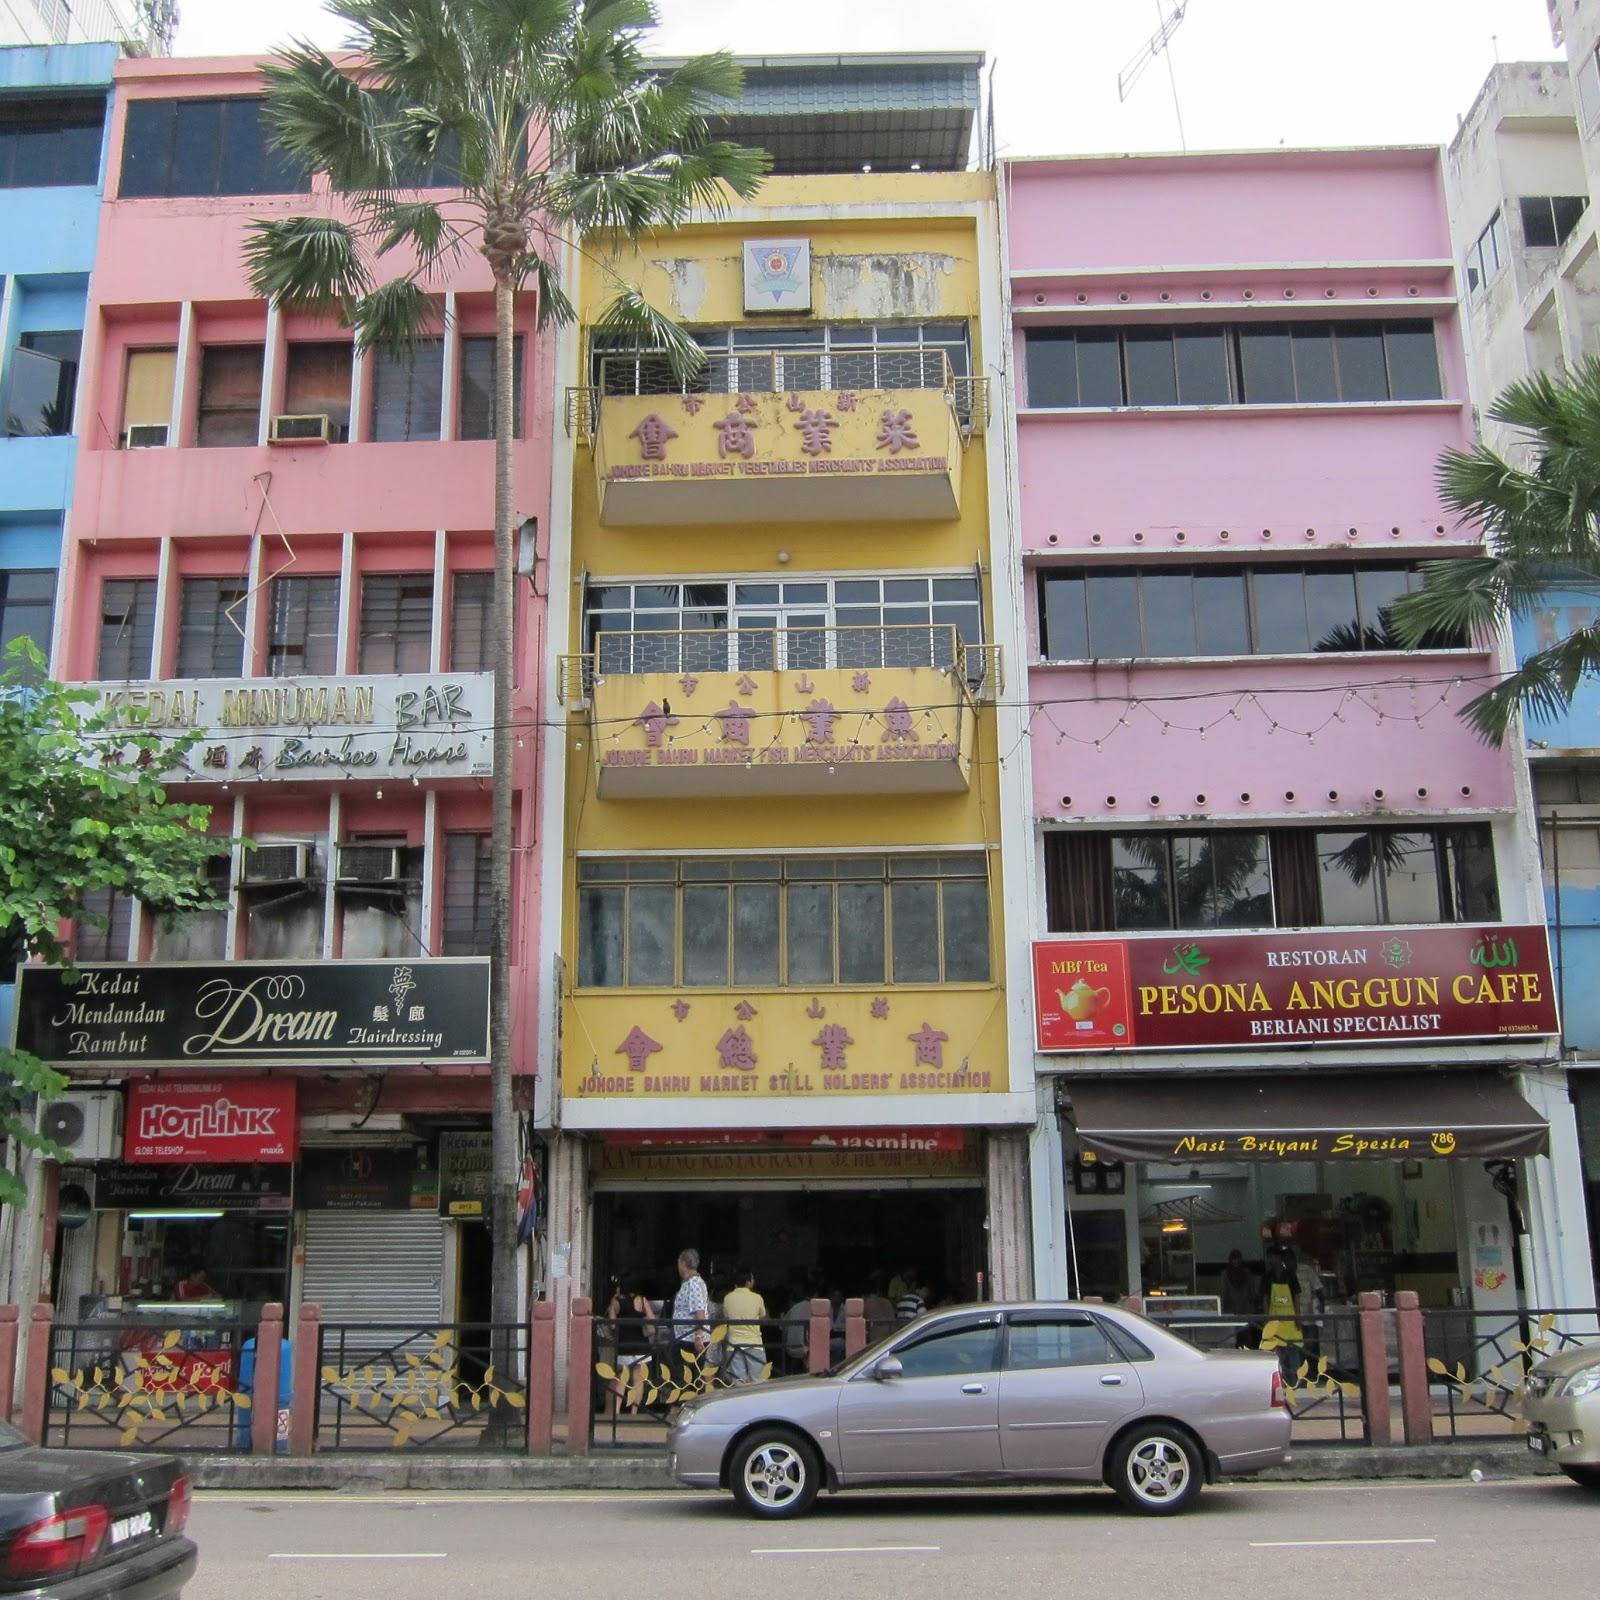 Kam Long Restaurant Curry Fish Head 金龙咖喱鱼头 Along Jalan